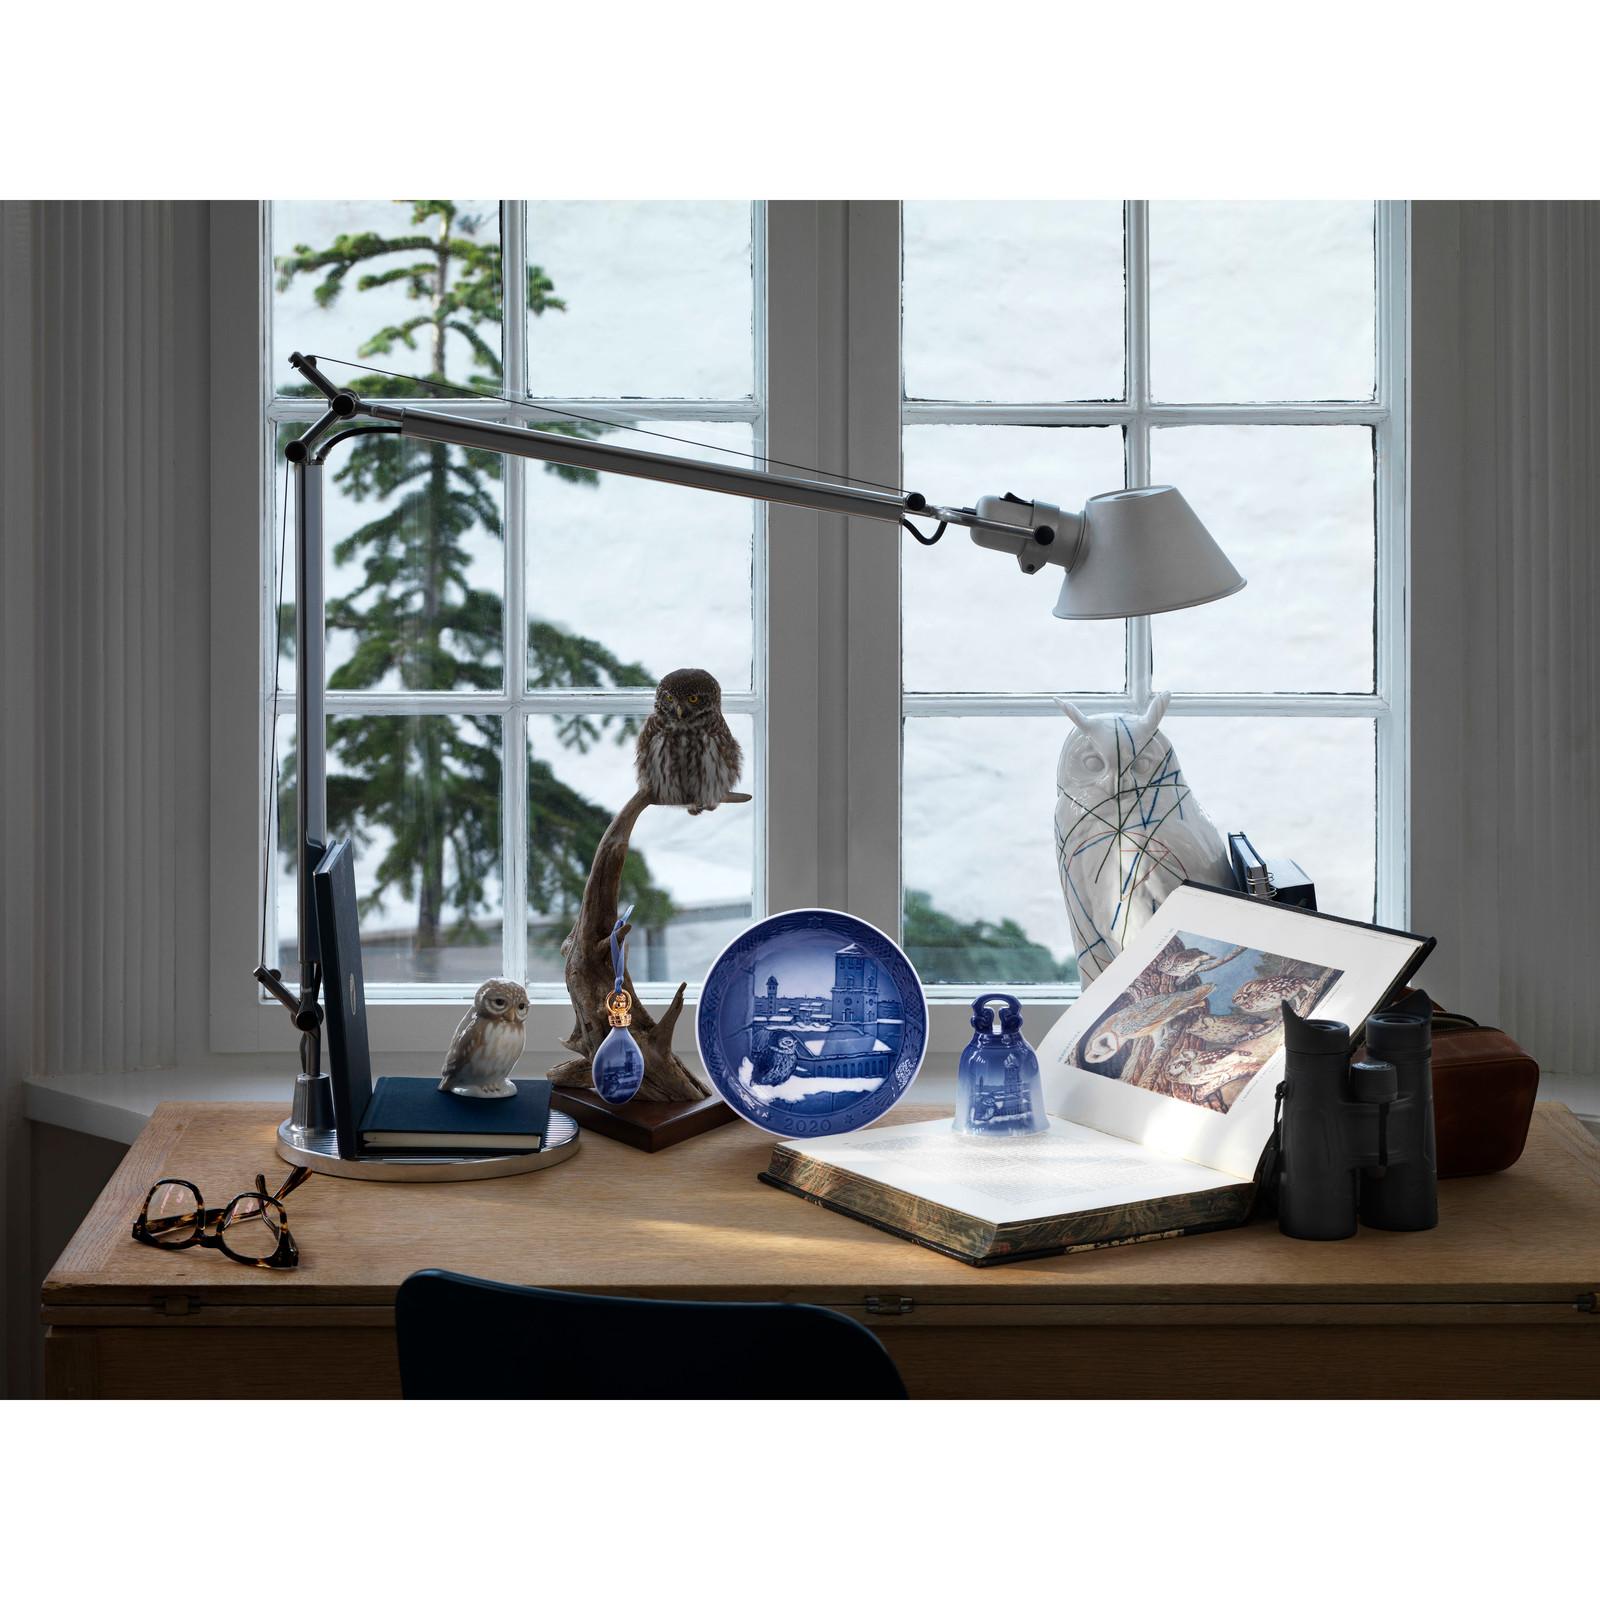 Royal Copenhagen 2020 Plate, Bell, Figurine